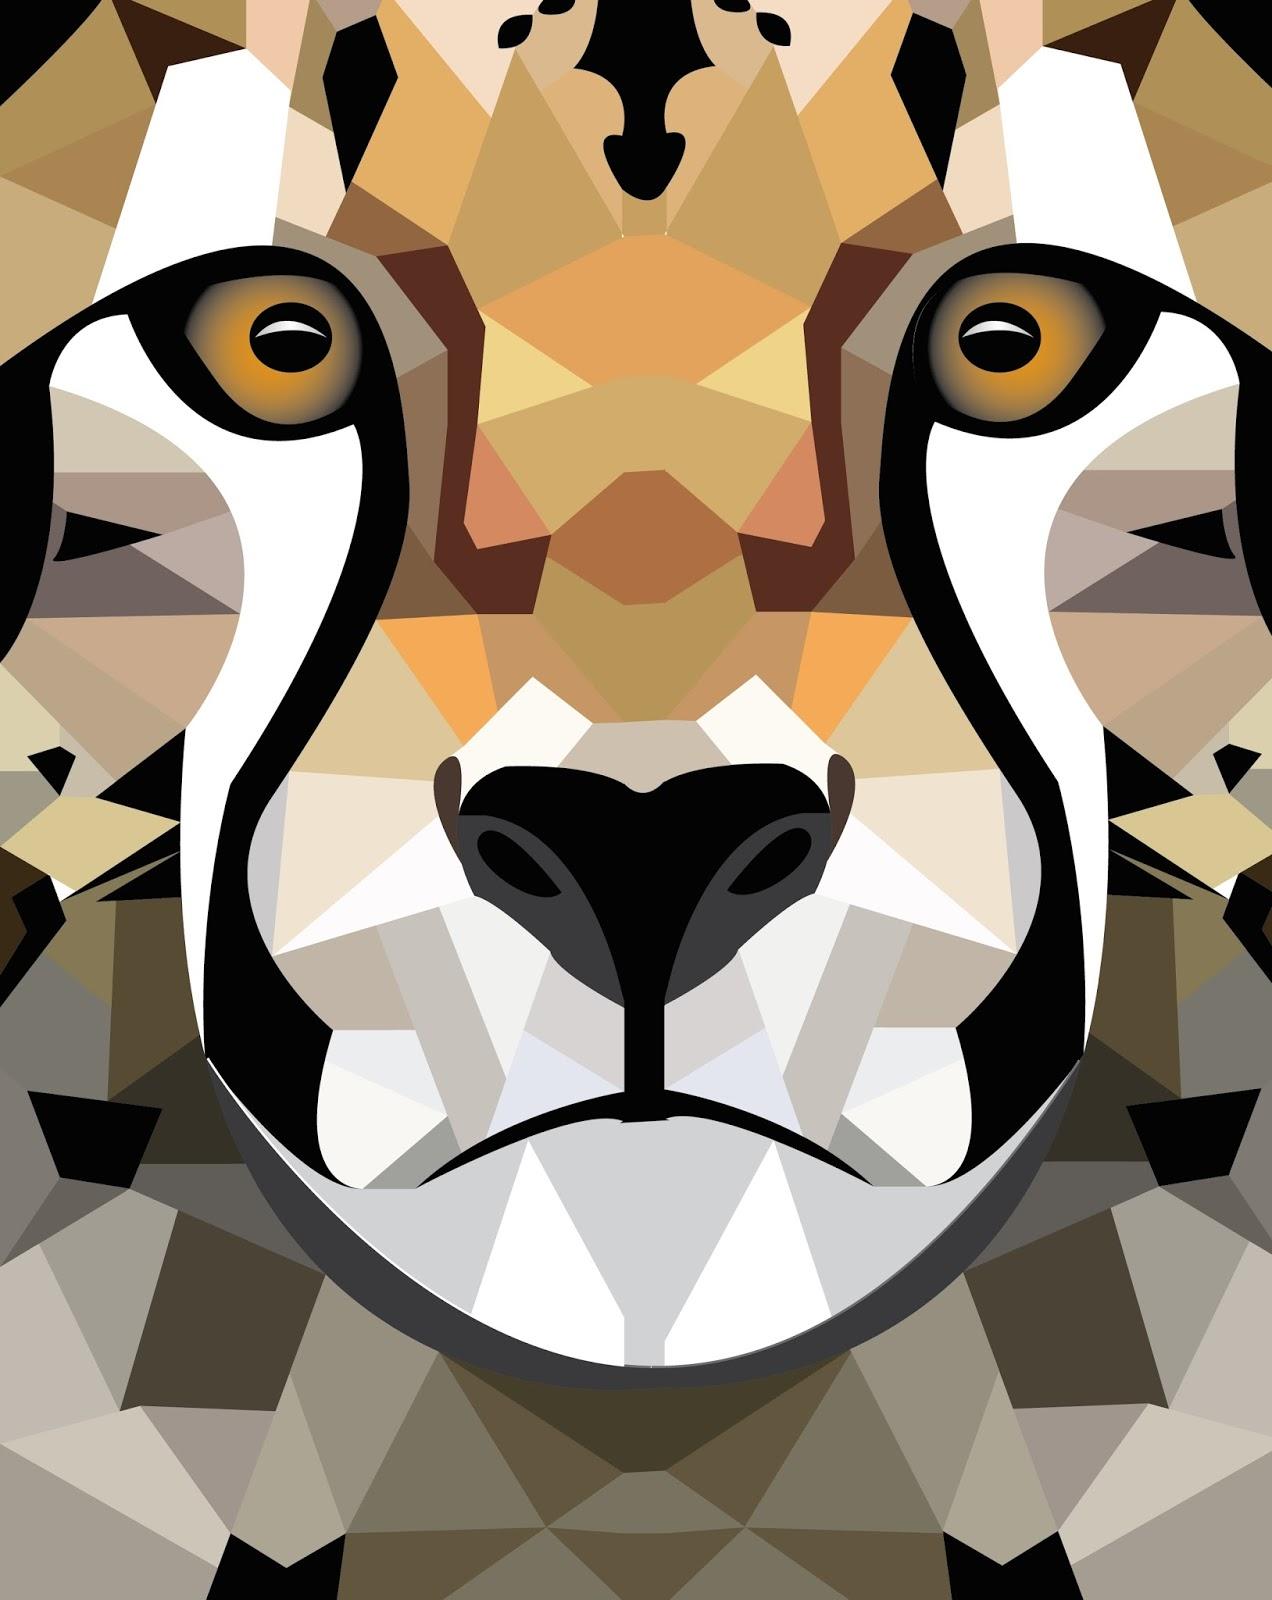 Skyline High School Graphic Design 1: Geometric Animal Head